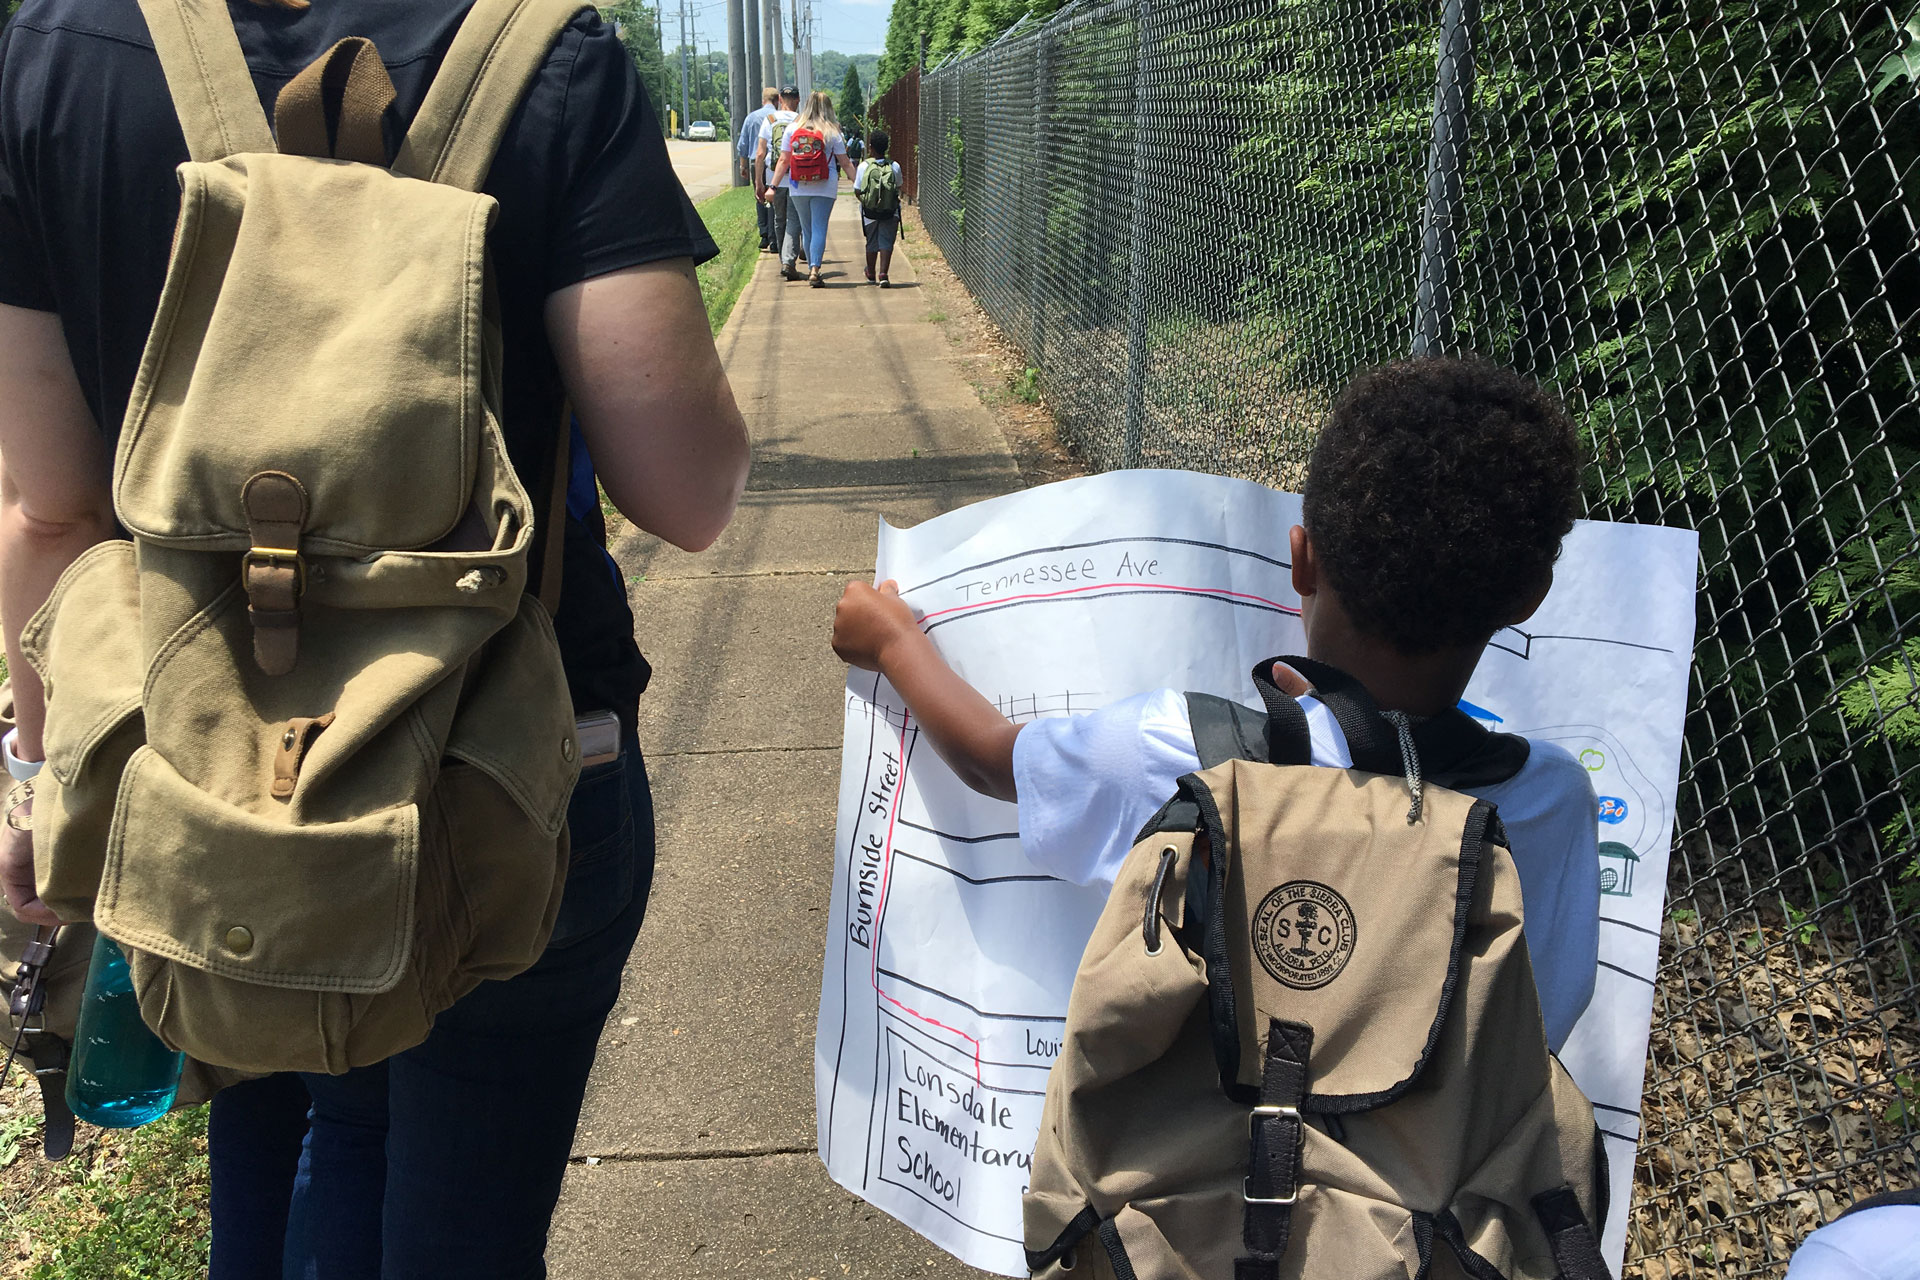 A student uses a map to navigate the neighborhood near school